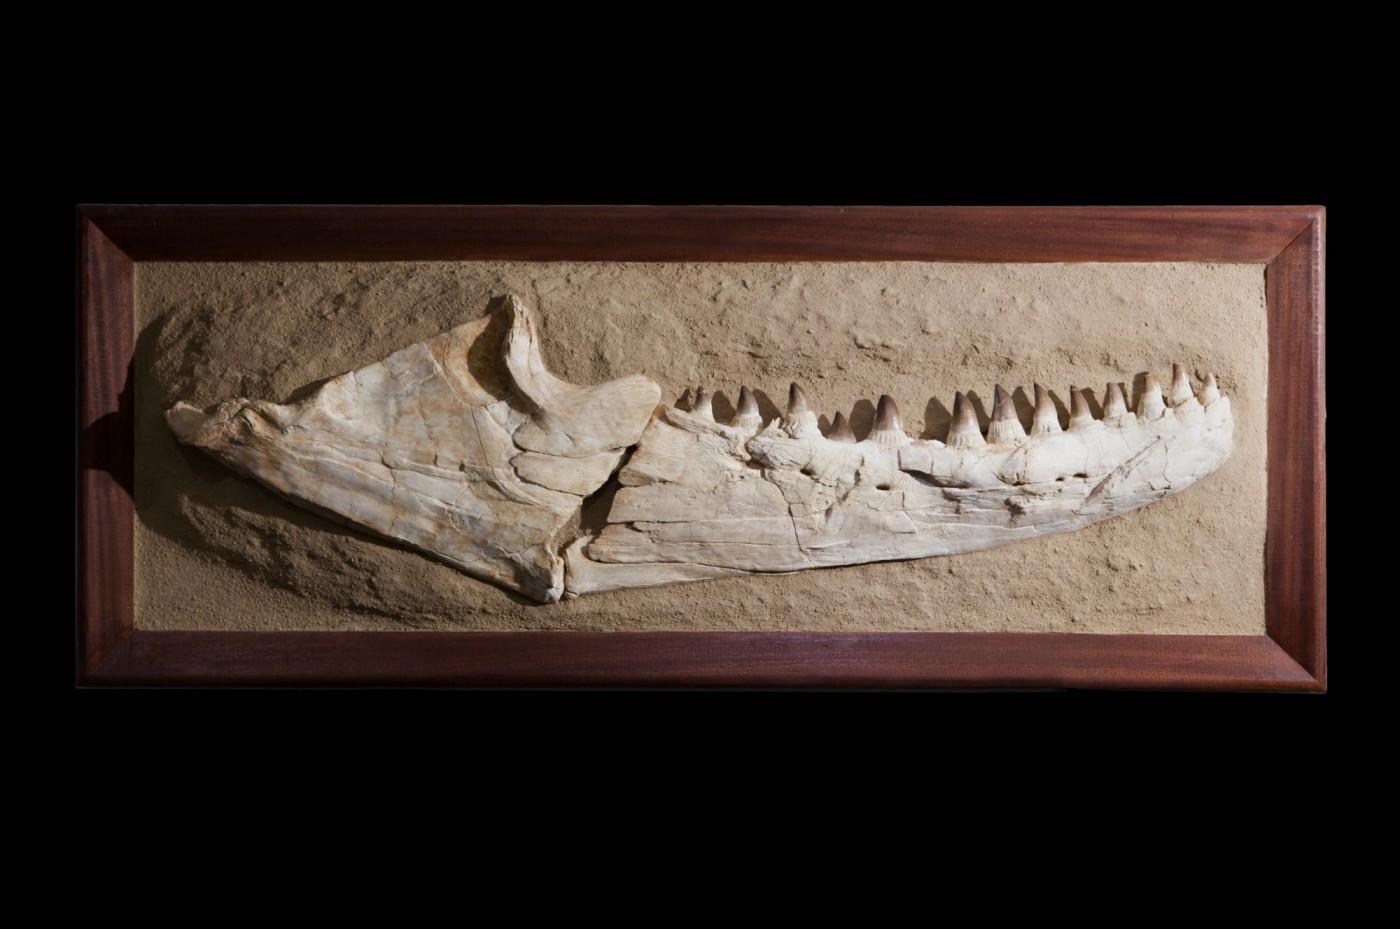 Mosasaur1.1